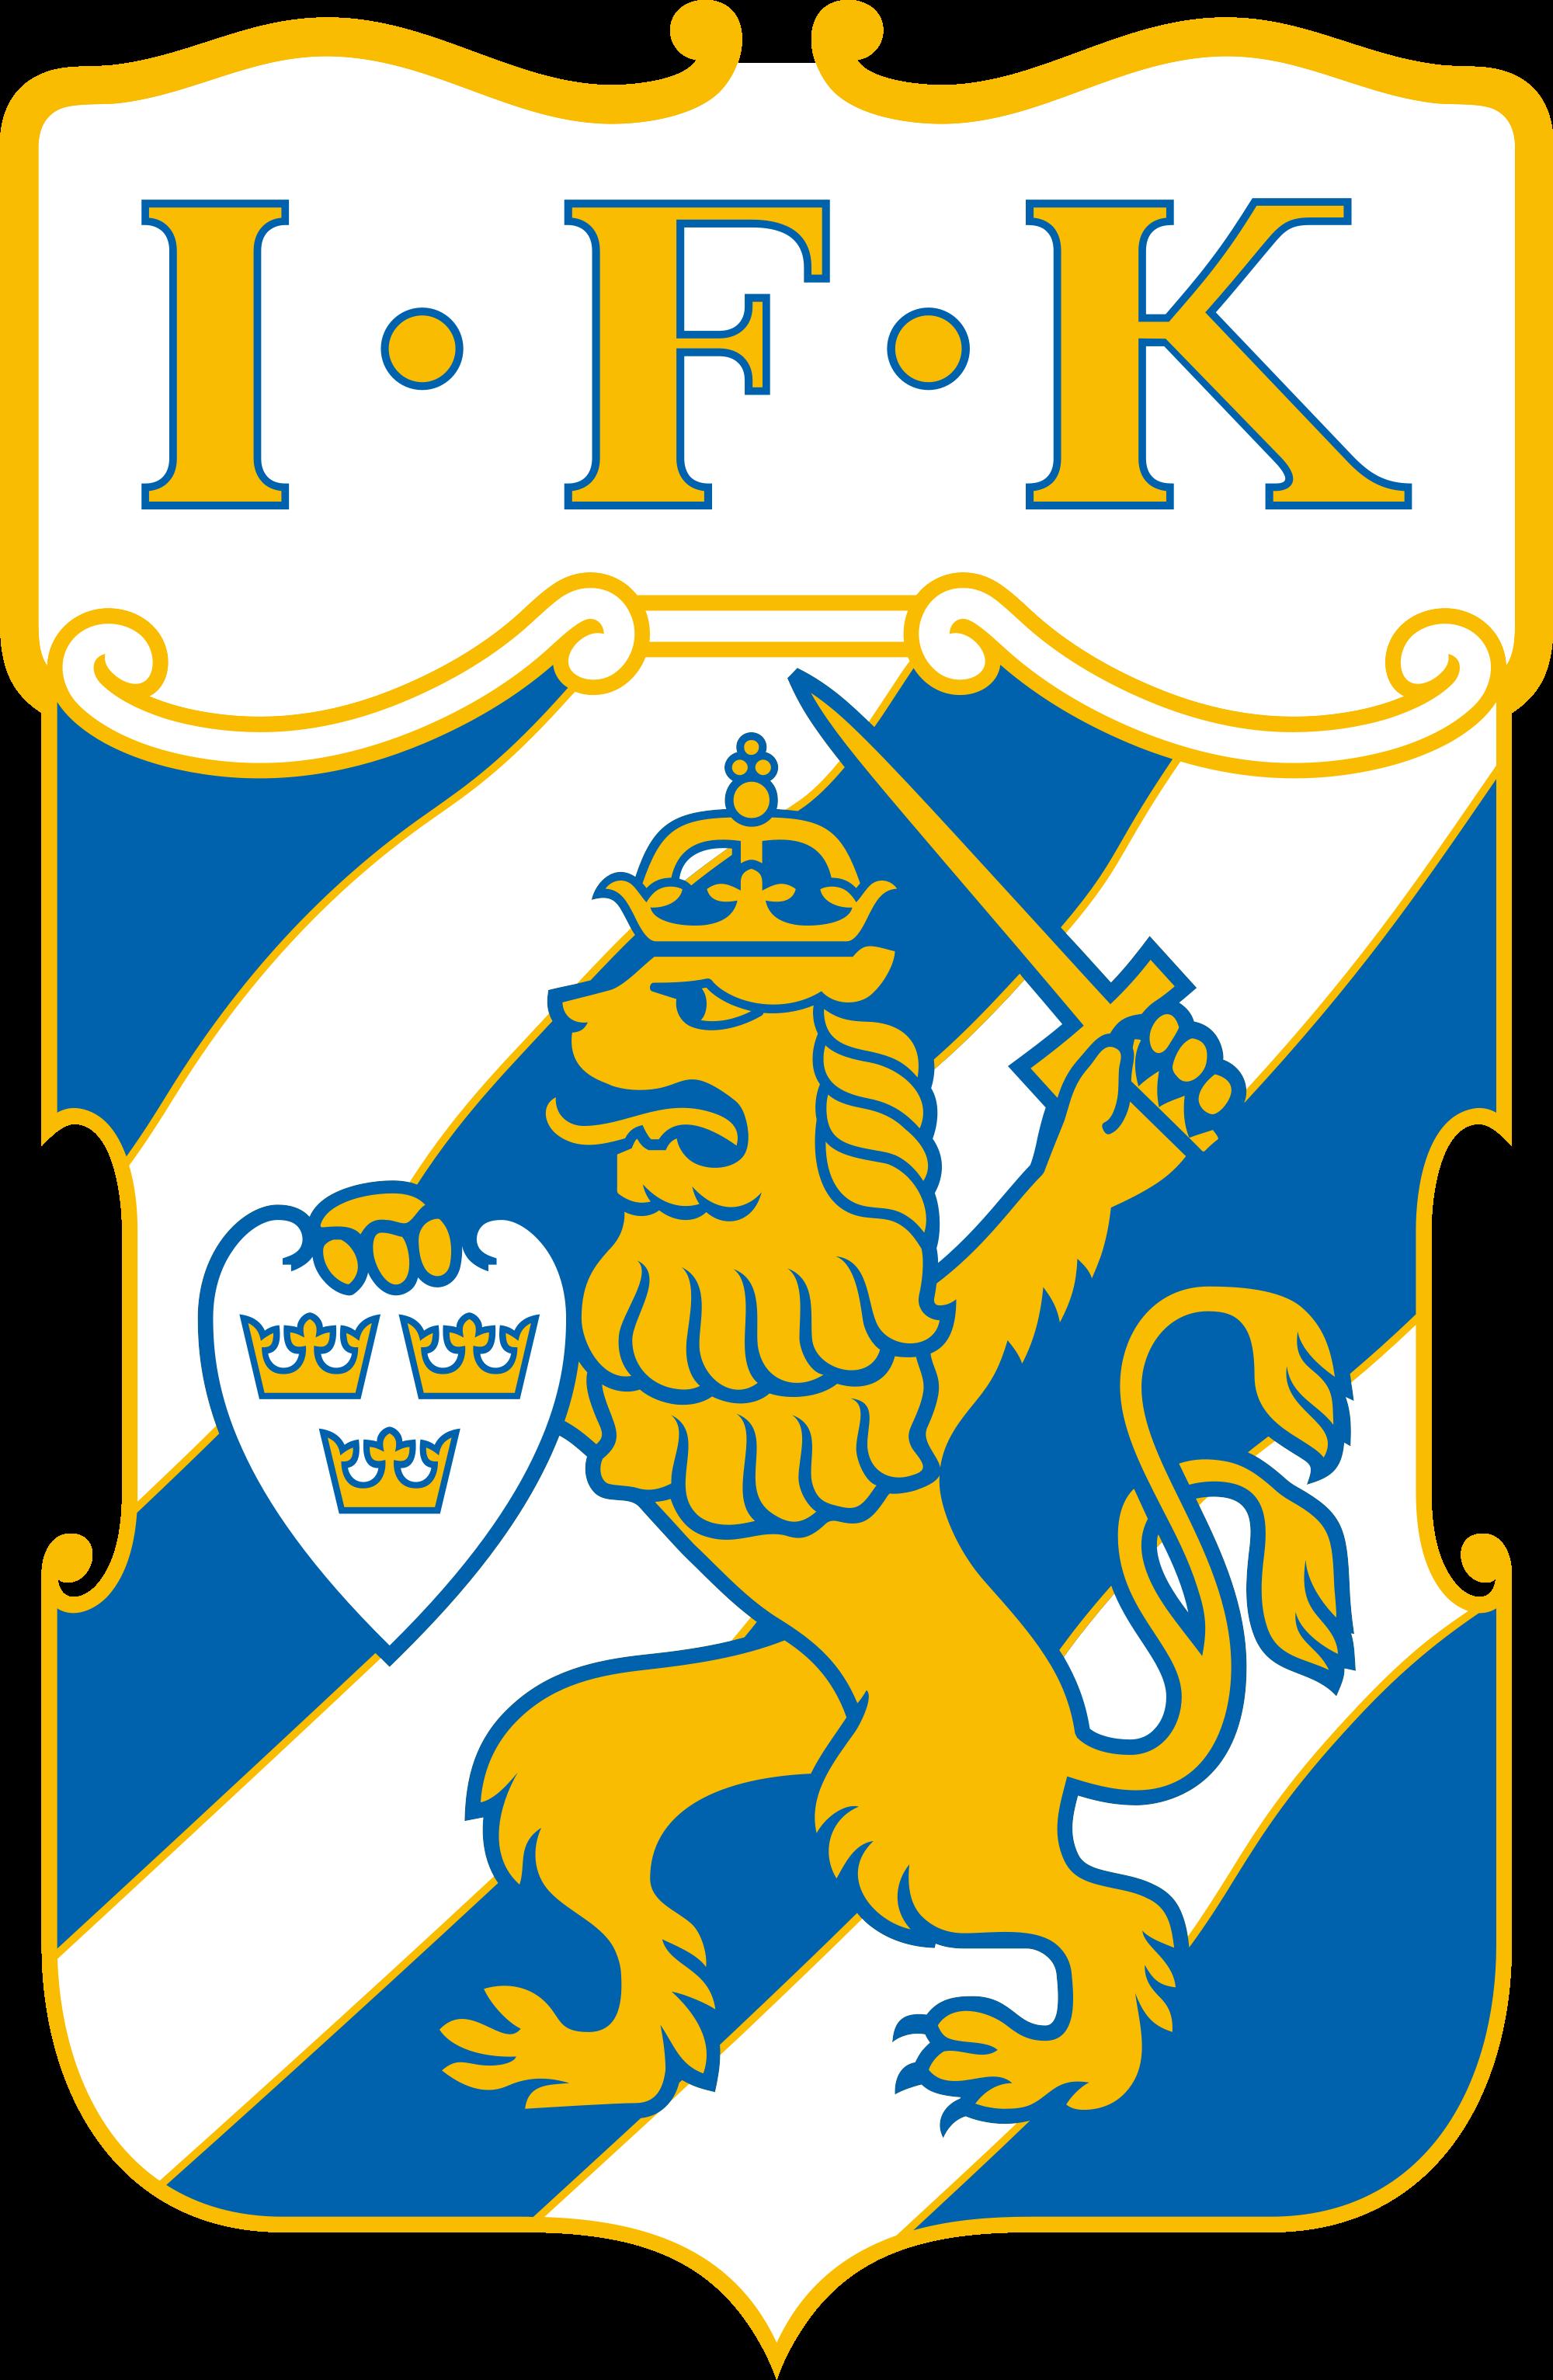 IFK Goeteborg herb 1995